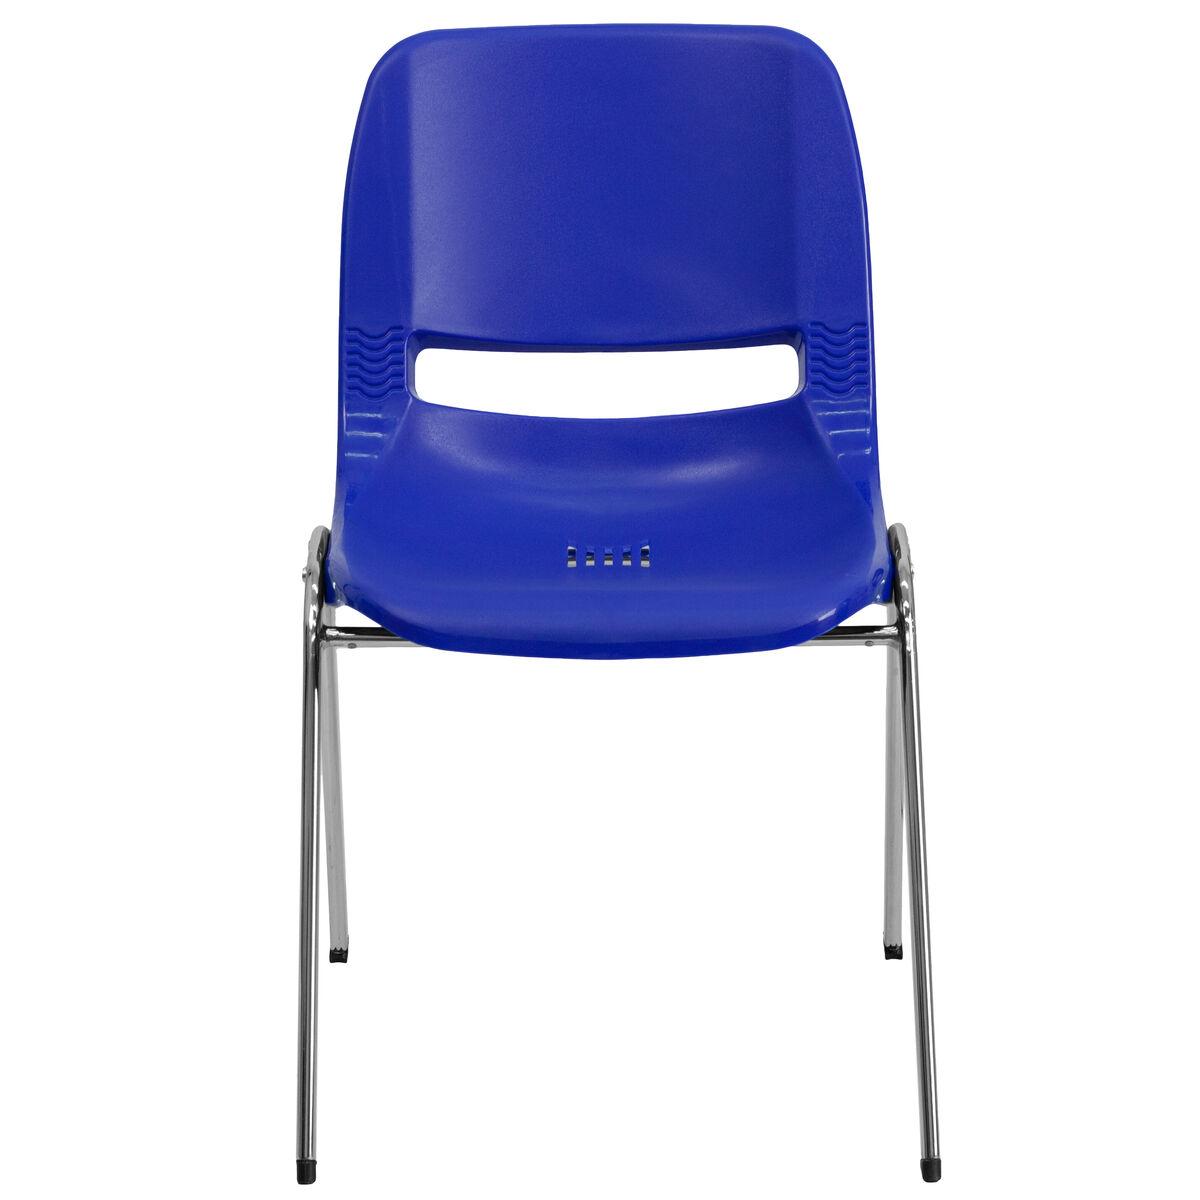 Tobago Stacking Chair Brown Chrome: HERCULES Series 880 Lb. Capacity Navy Ergonomic Shell